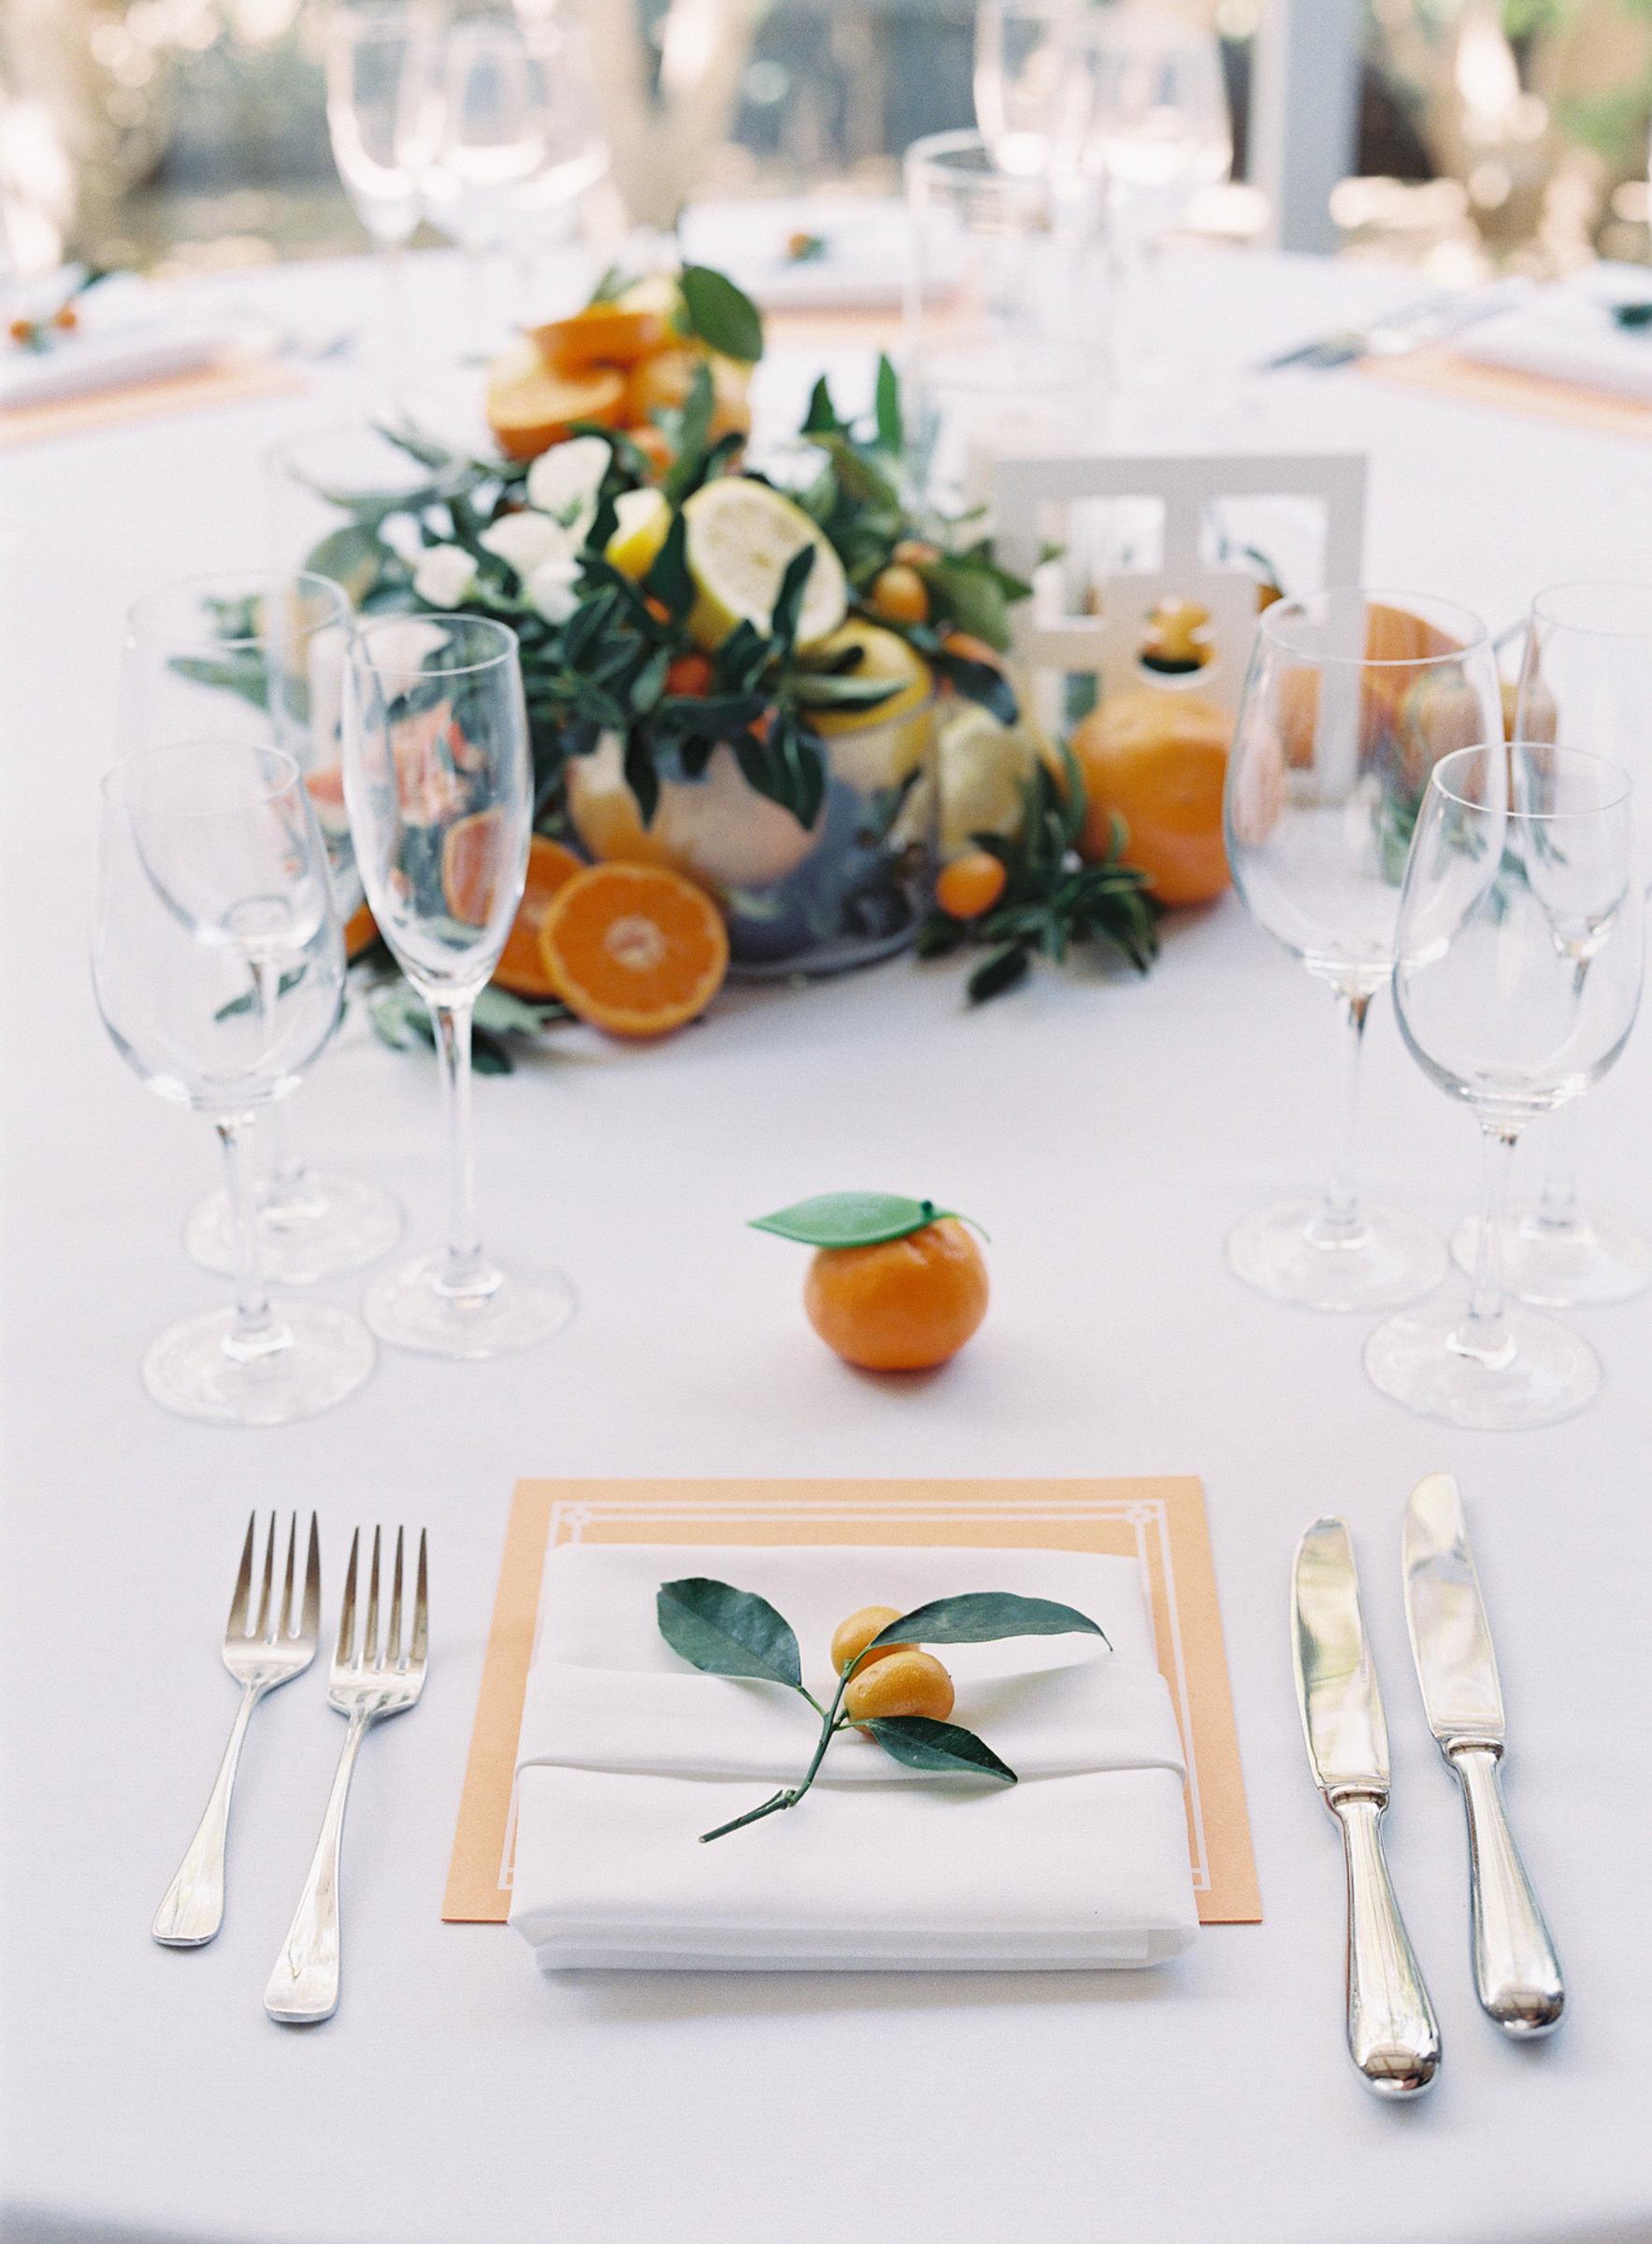 citrus-centerpieces-with-kumquat-napkin-accents-photographed-by-corbin-gurkin-worlds-best-wedding-photos